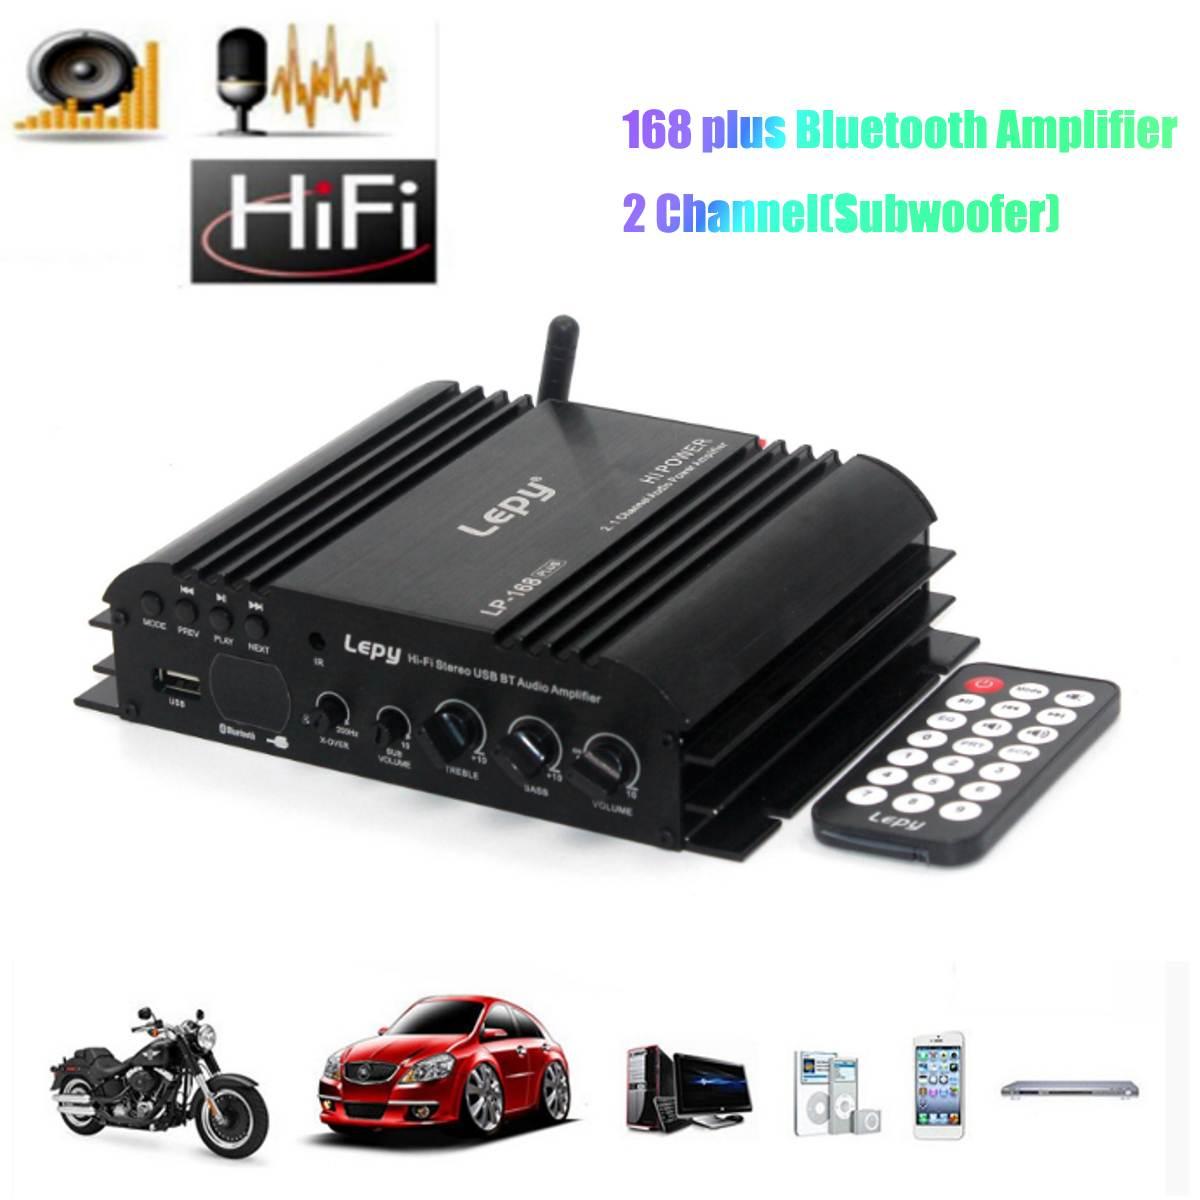 Bluetooth Usb Mini Digital Amplifier Hifi 2ch Subwoofer Amp For Car Home Speaker